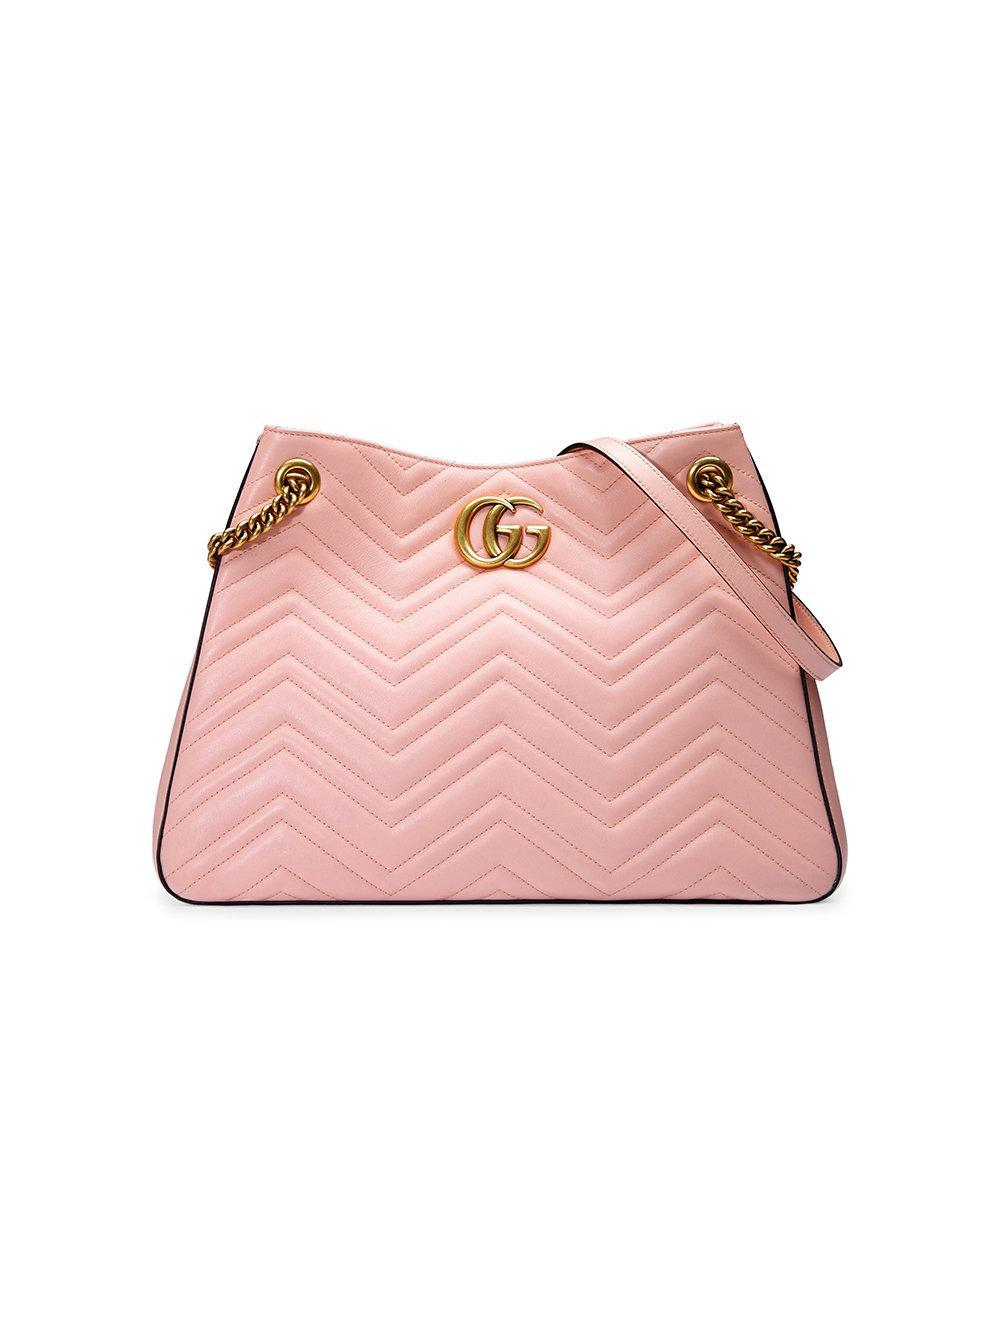 0a30681017b1 Gucci Gg Marmont MatelassÉ Shoulder Bag | ModeSens